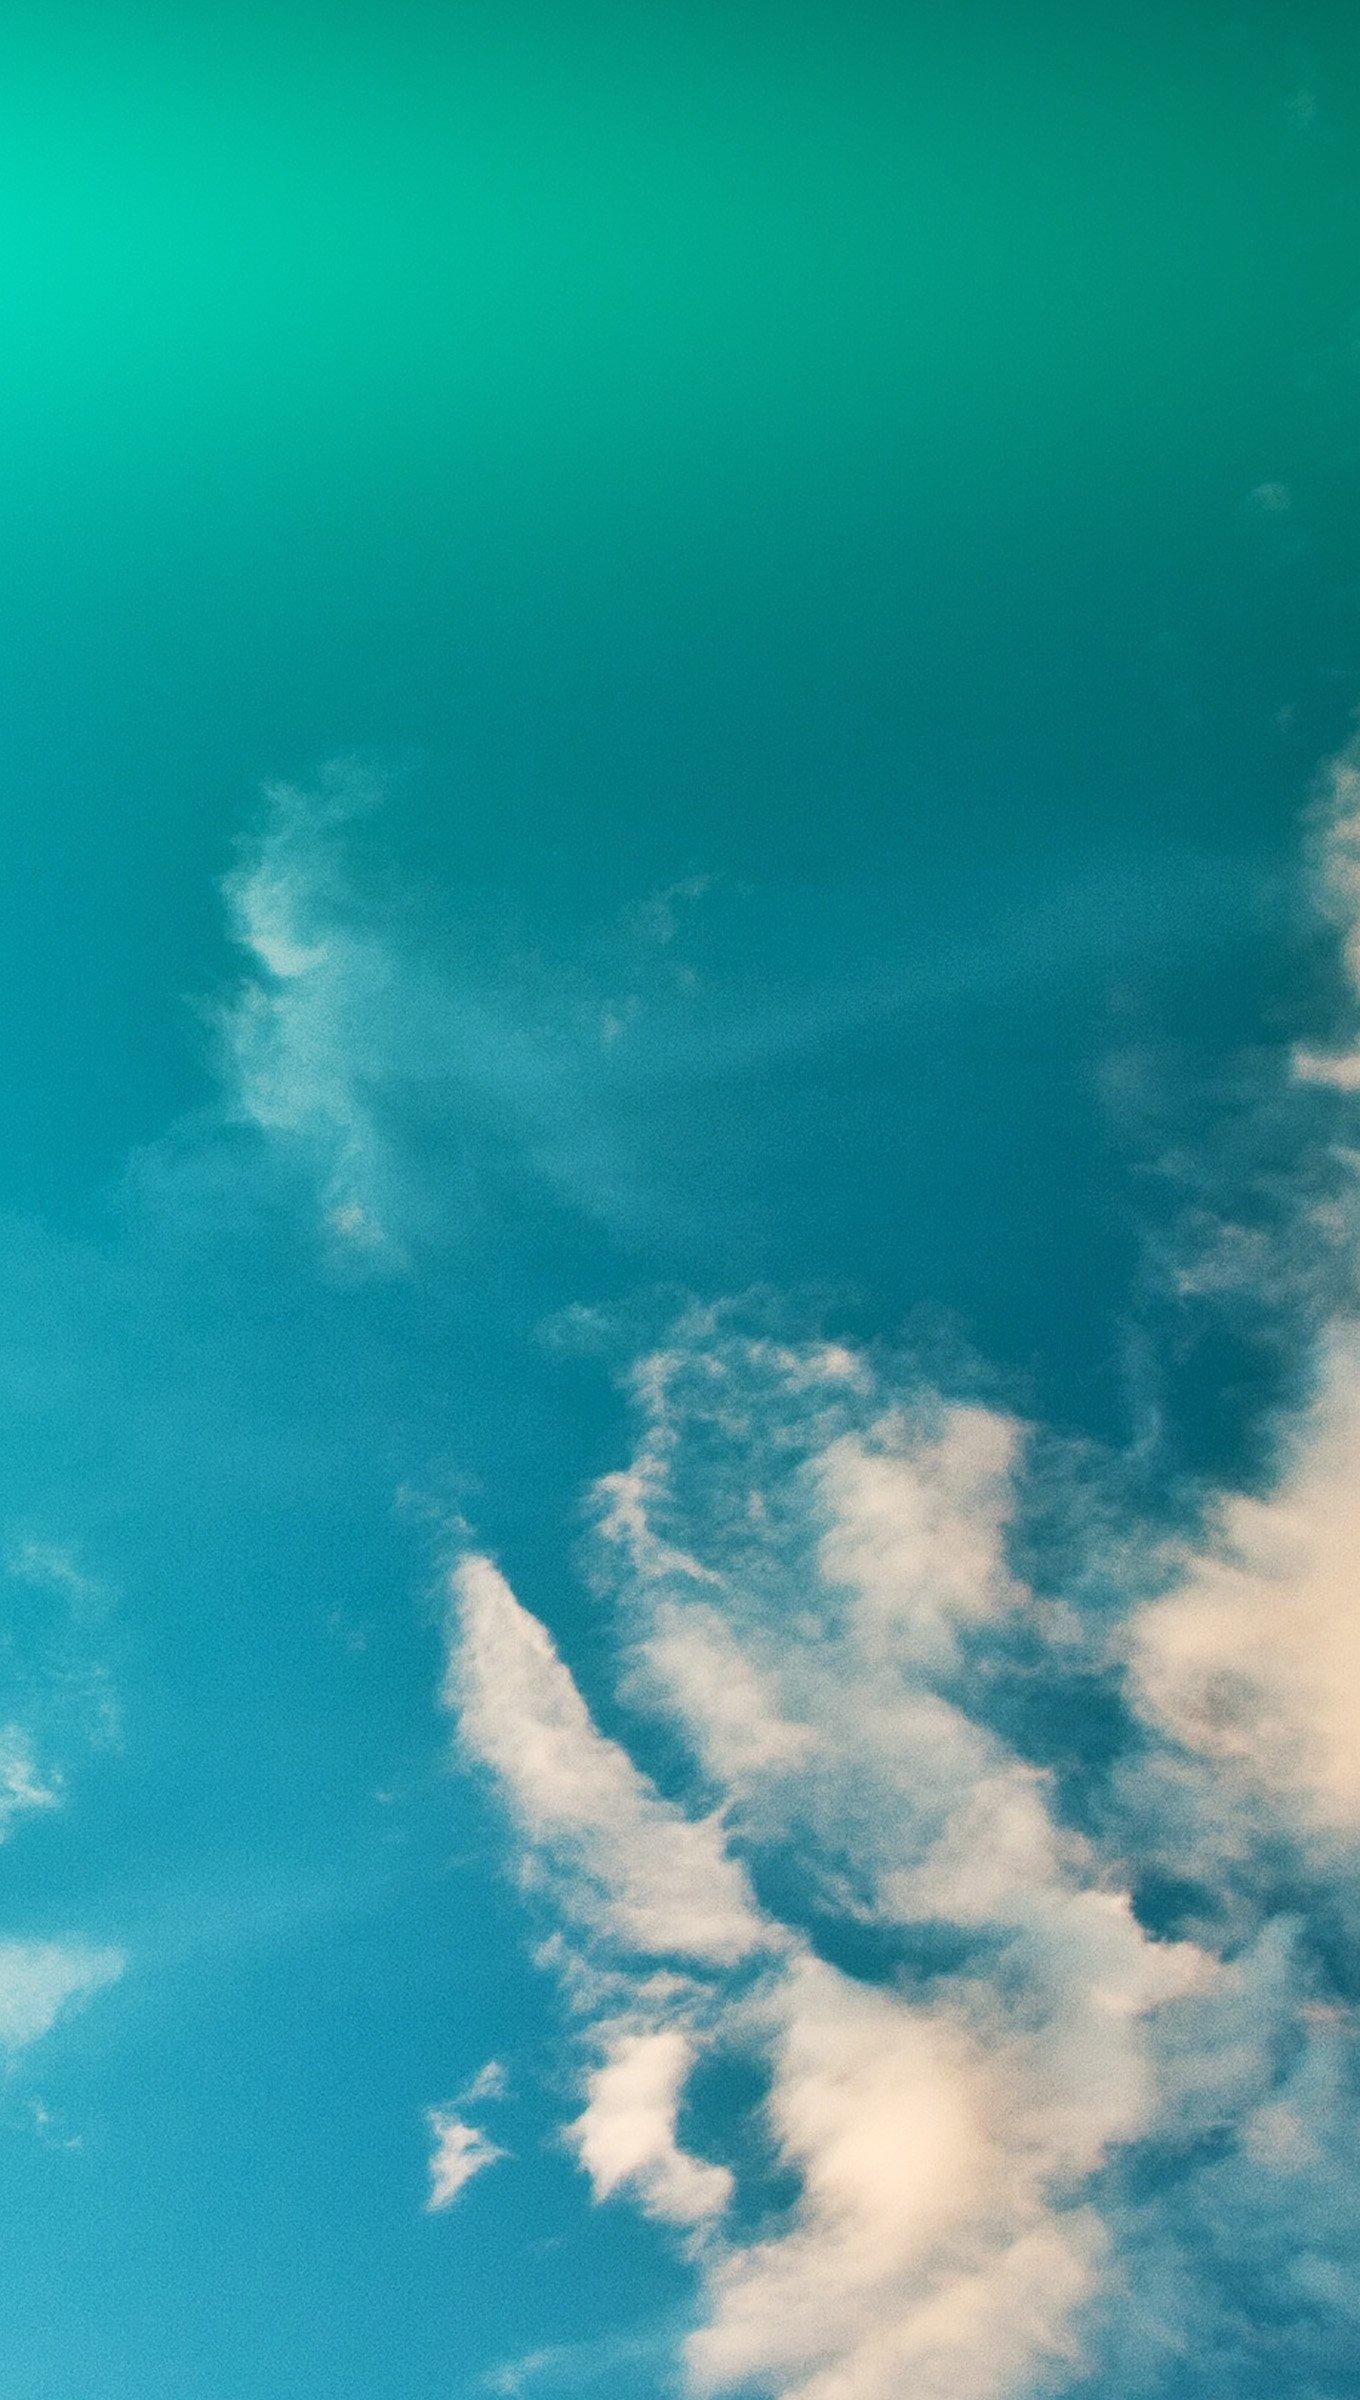 Wallpaper Clouds in the sky Vertical